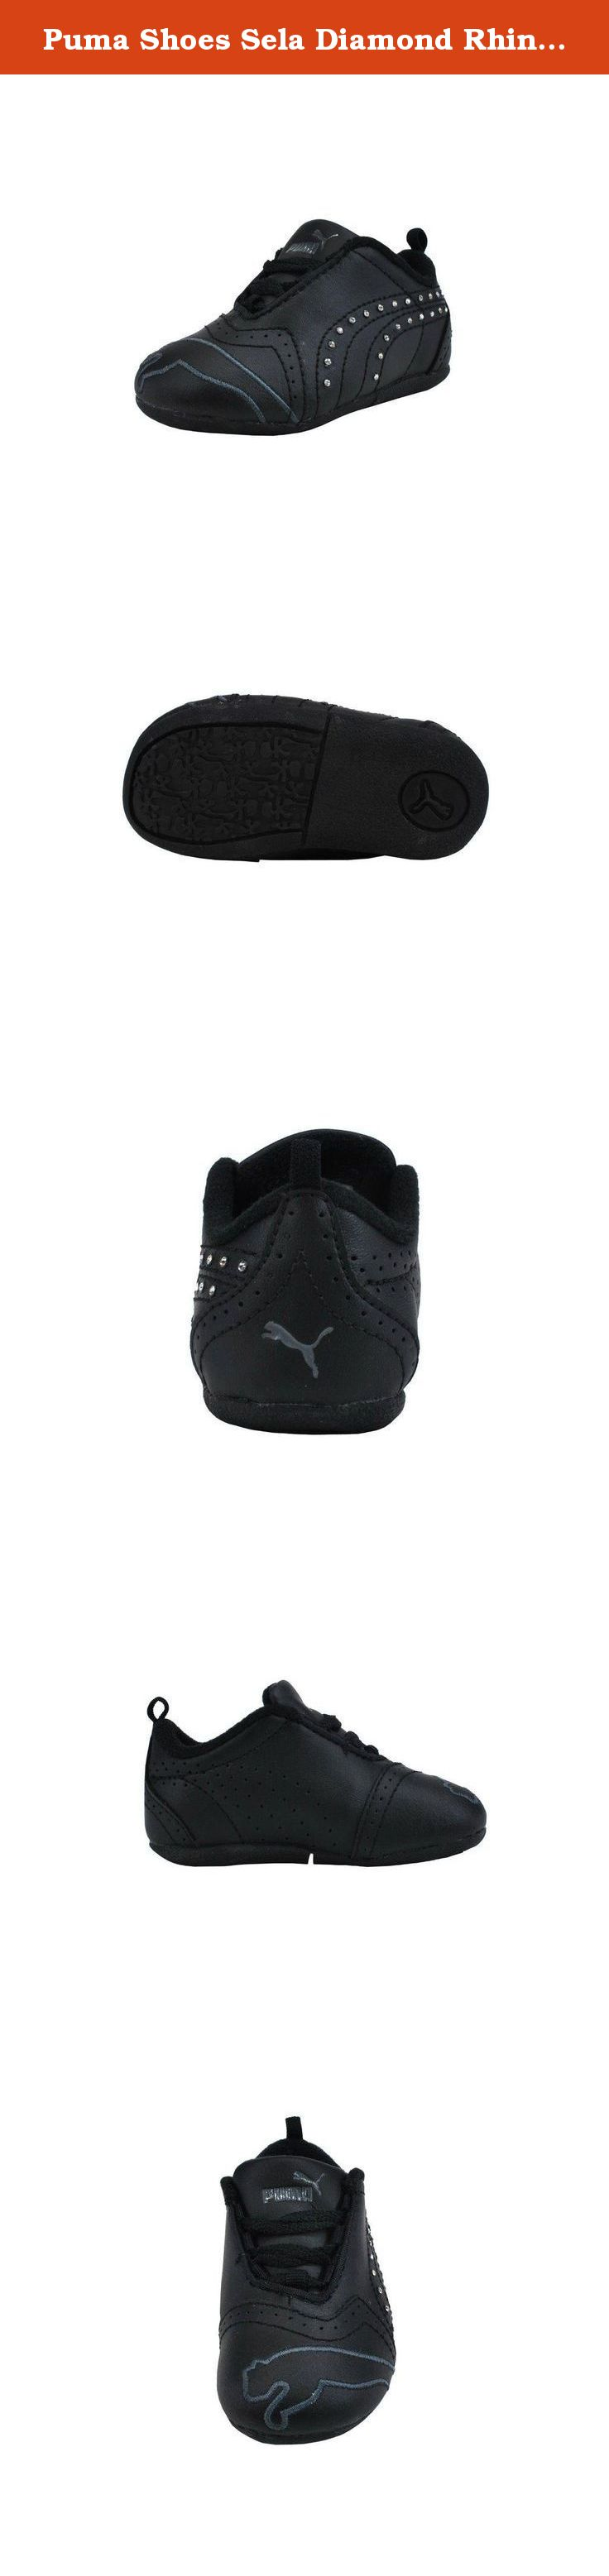 79dfc320c14 Puma Shoes Sela Diamond Rhinestone Infant Toddler Black Sneakers (4 M US  Toddler).